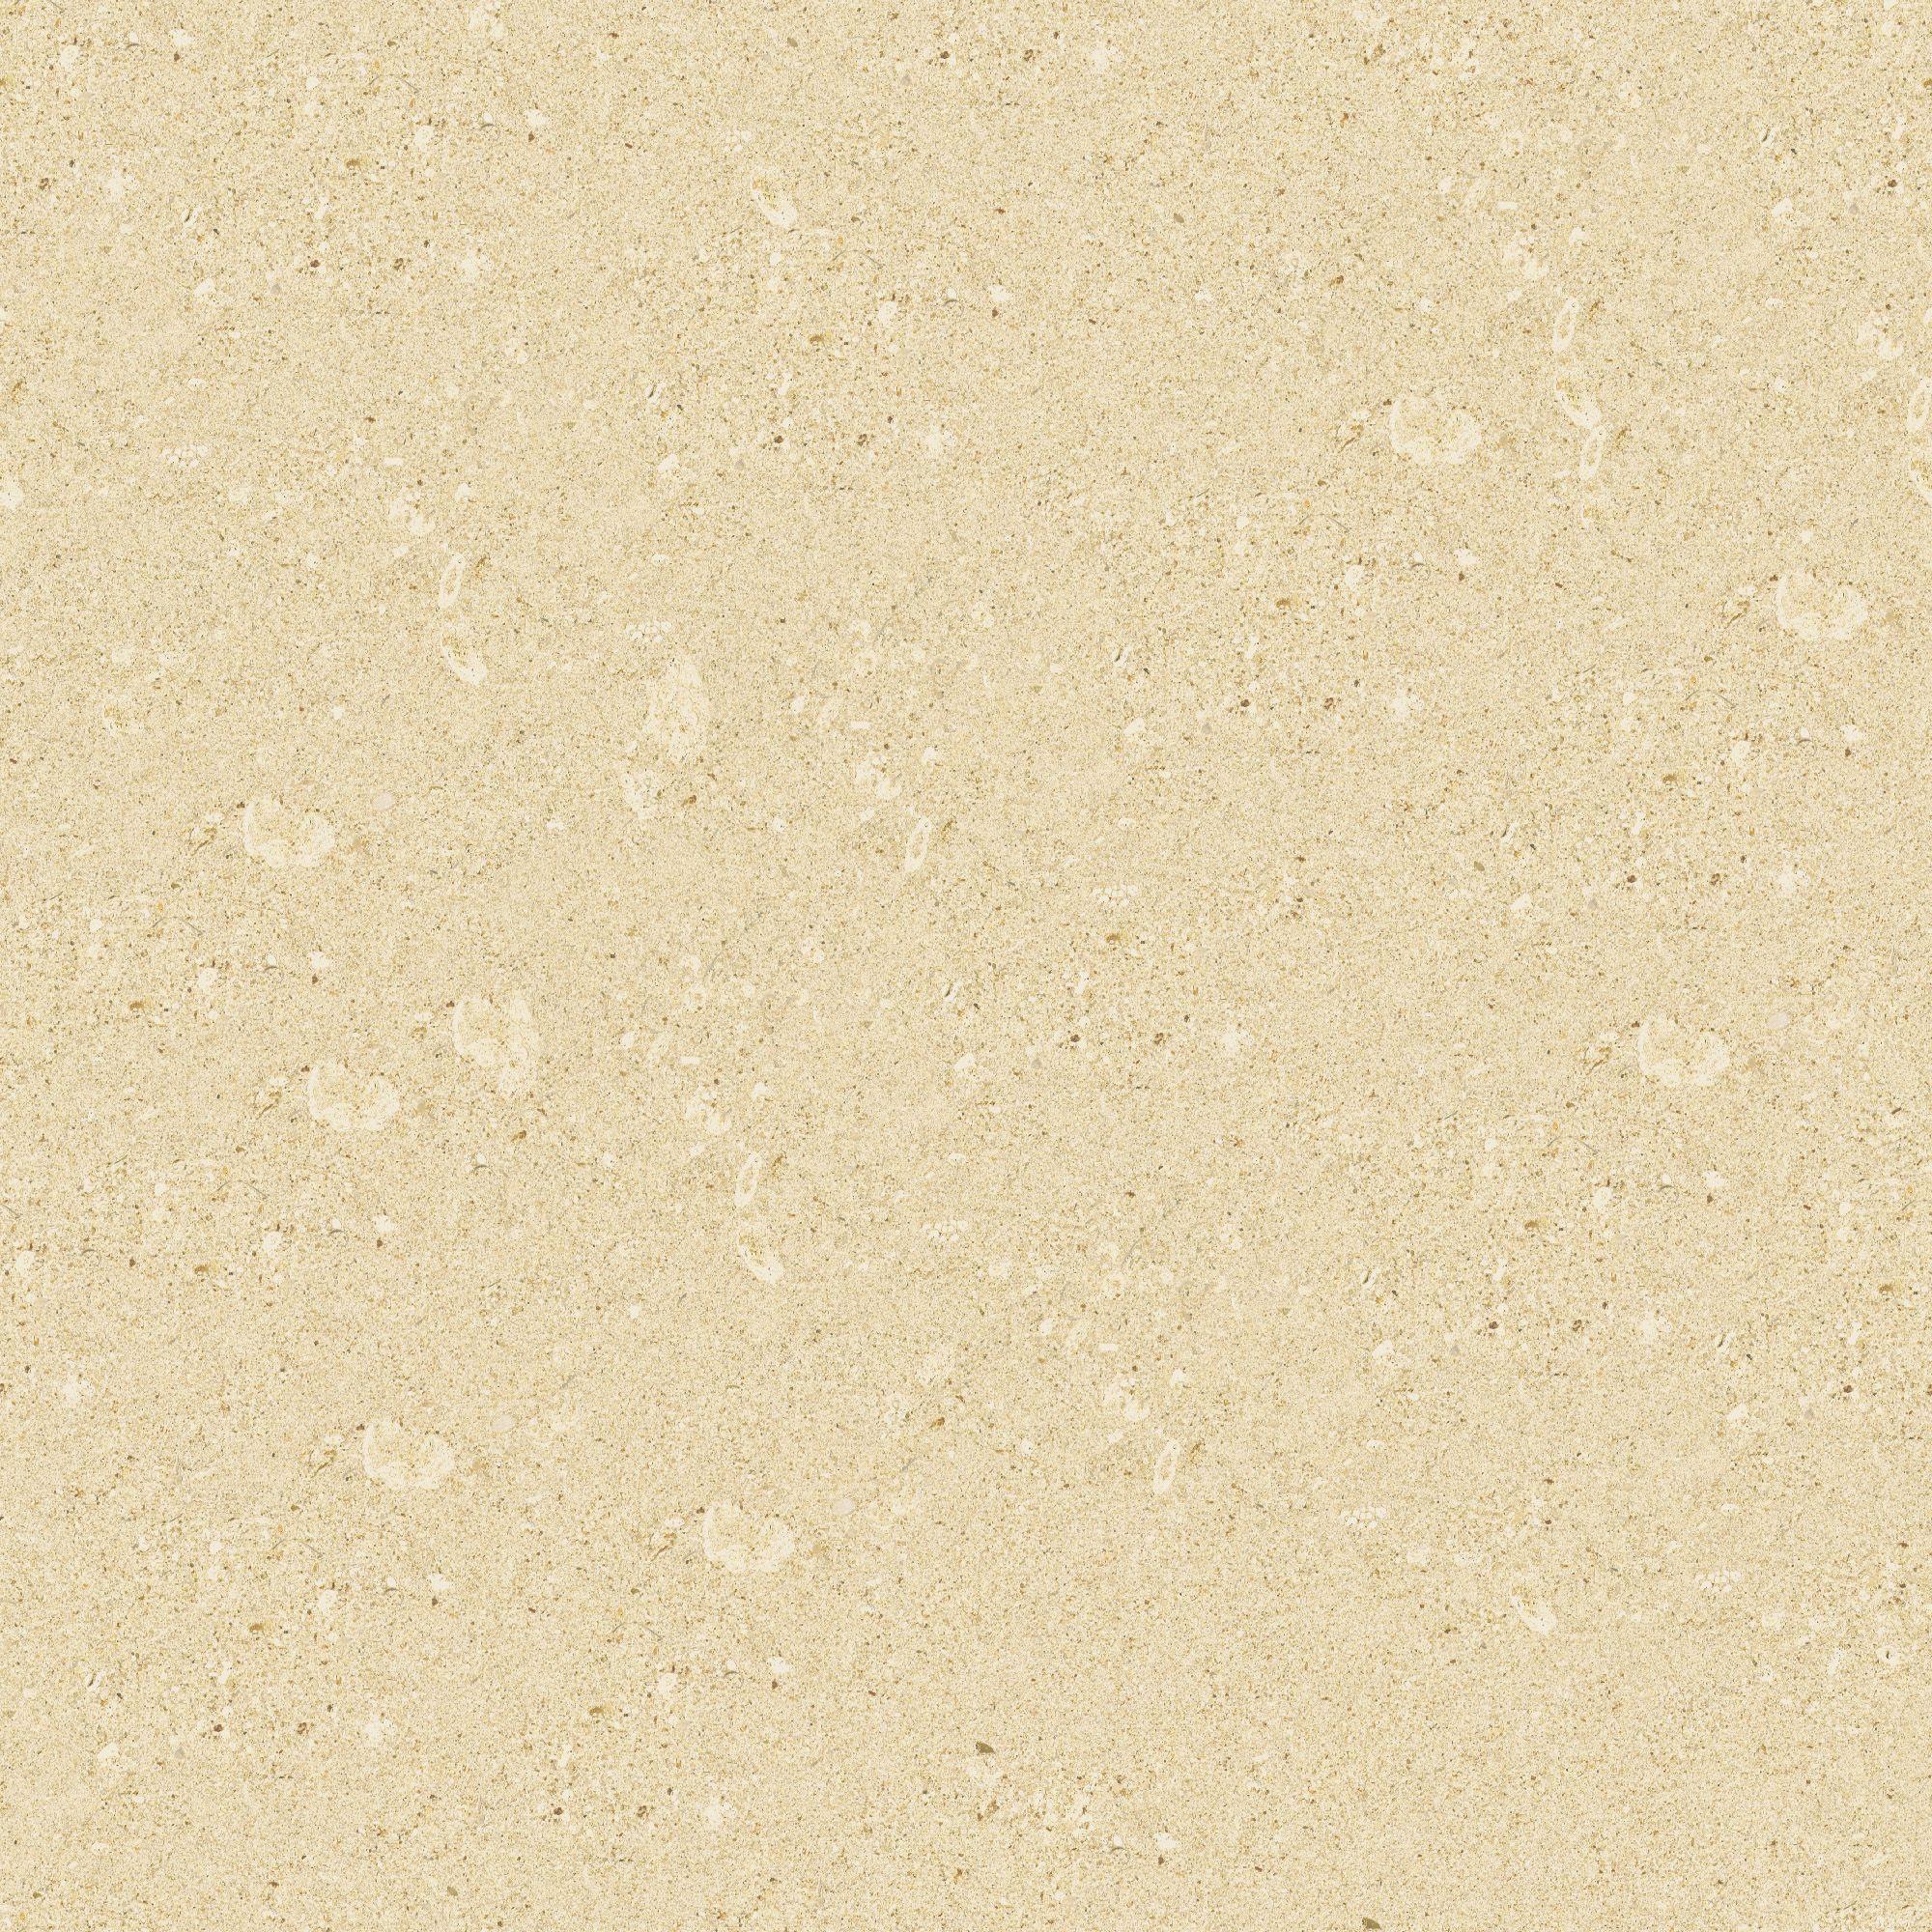 Pietra Bianca di Vicenza Range 1 Marmi Serafini | Materials | Marmi ...